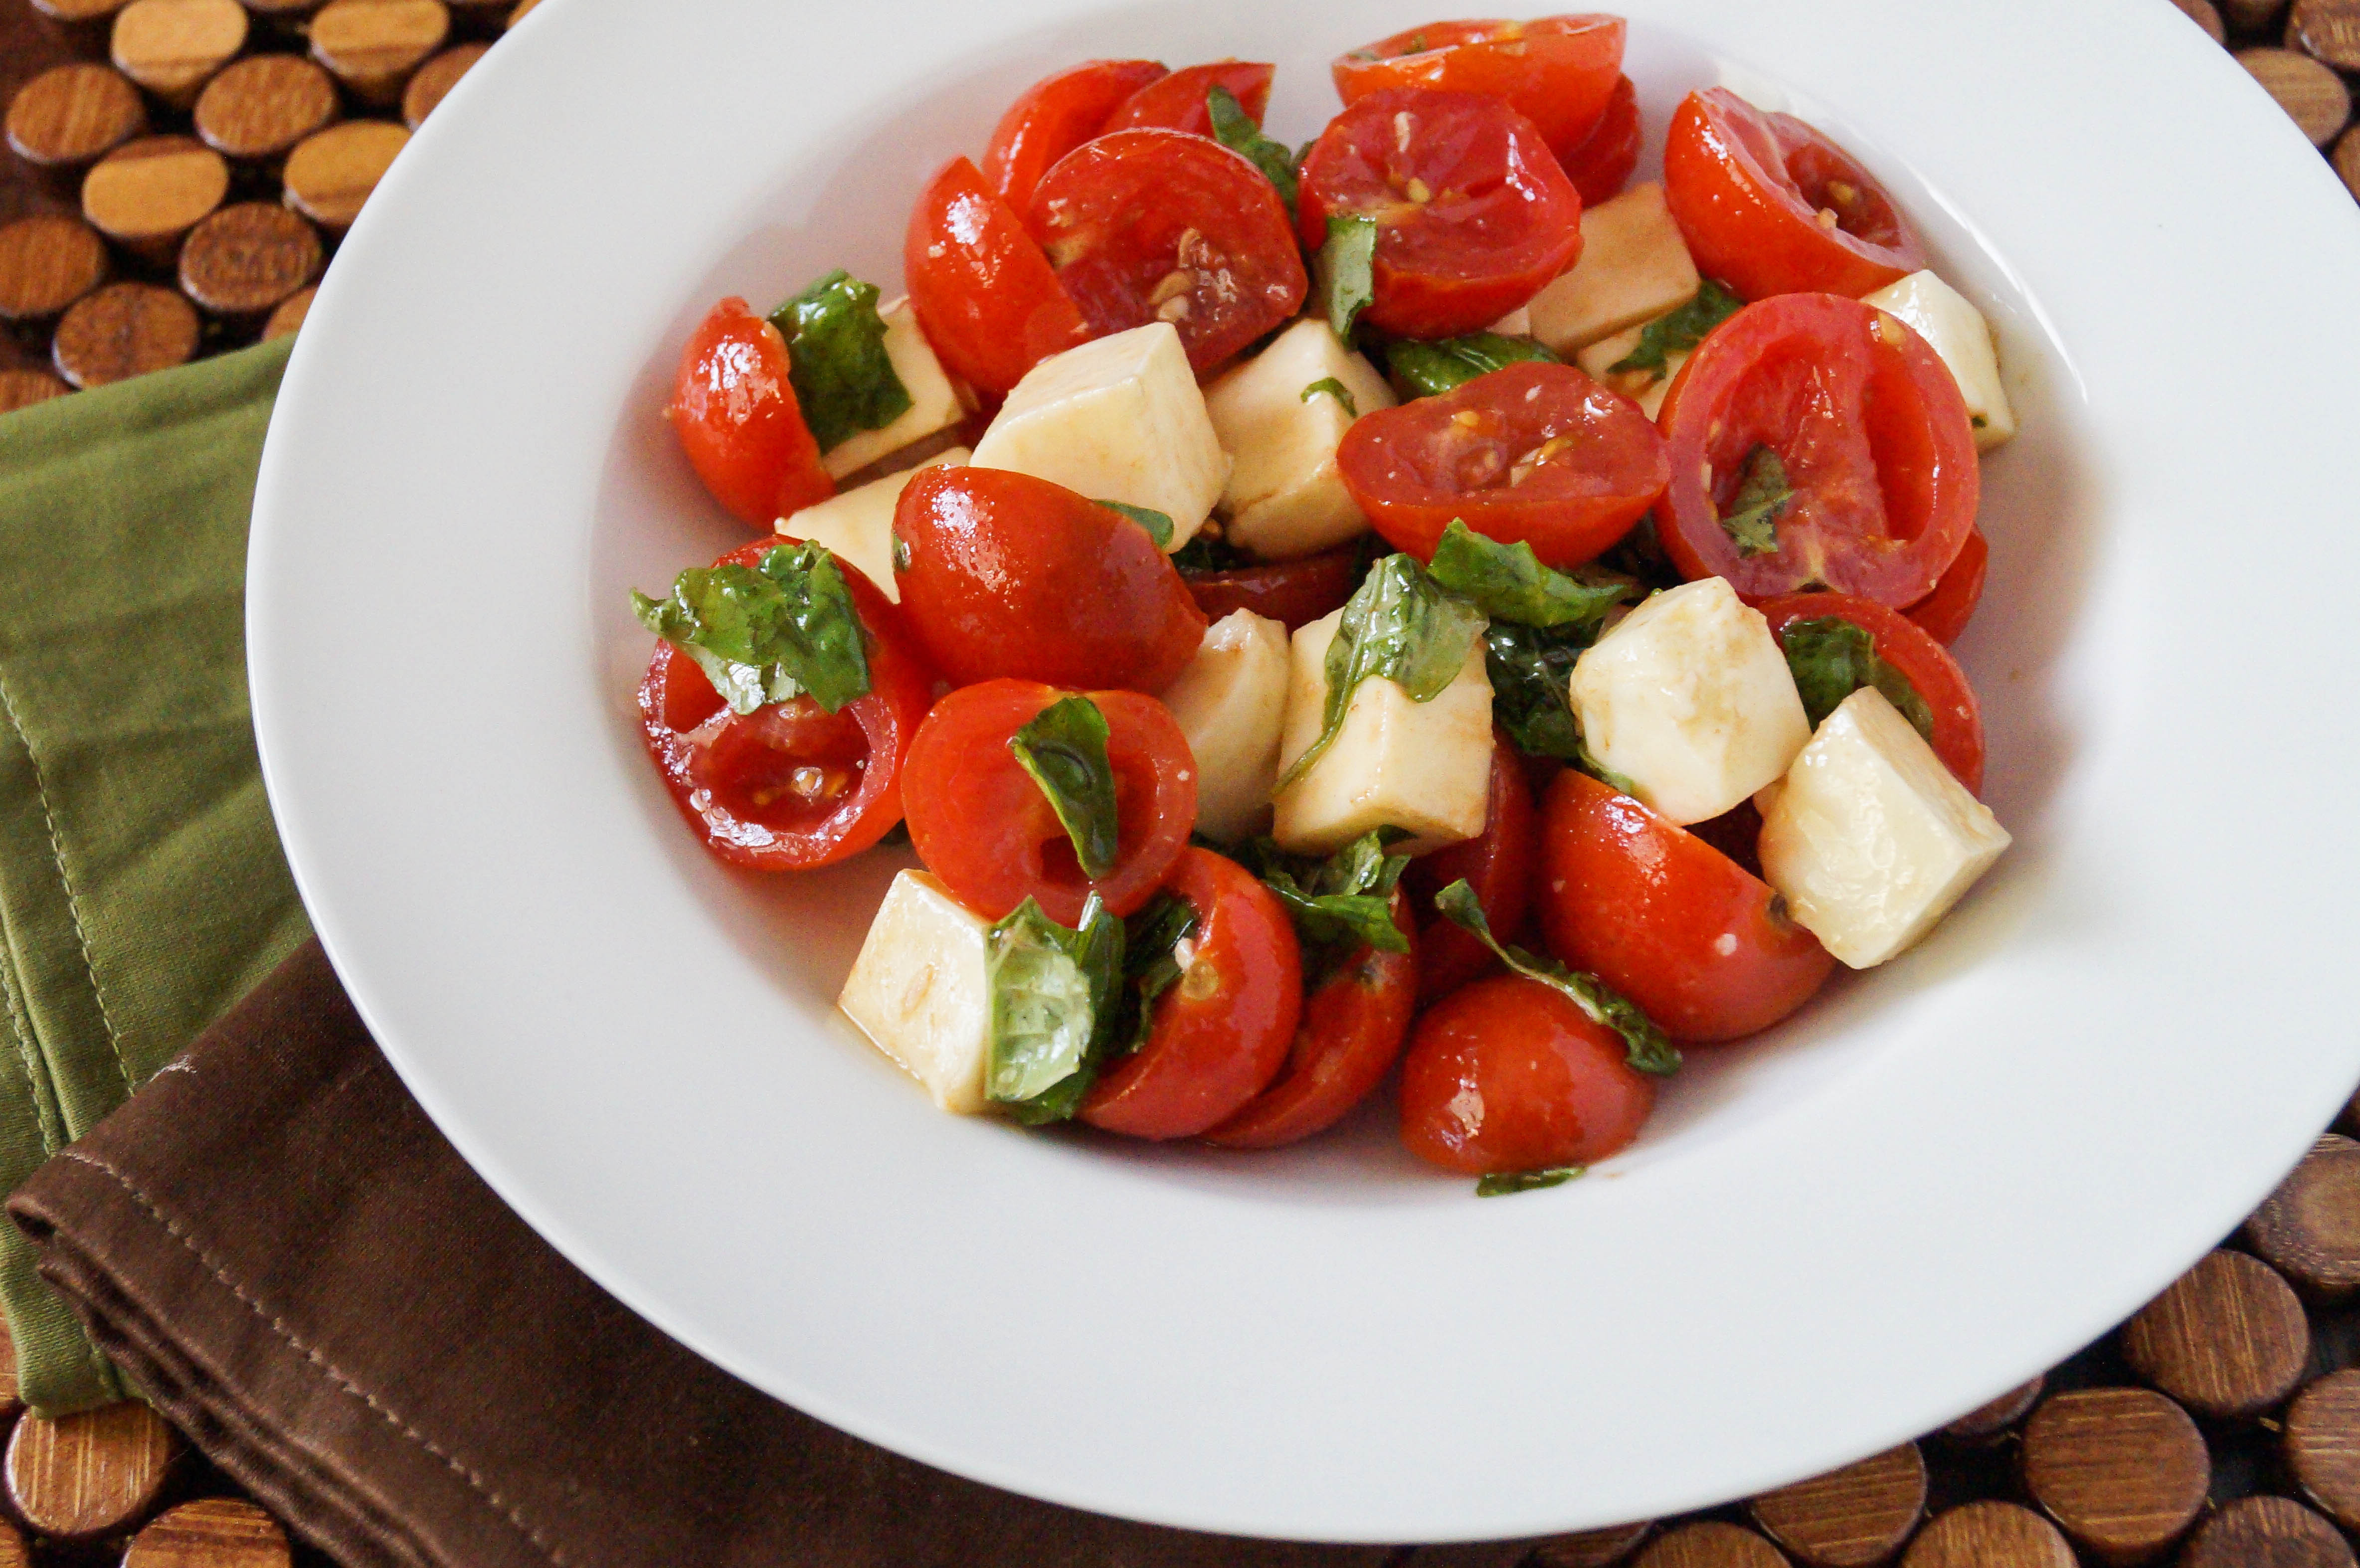 Tomato Caprese Salad  Cherry Tomato Caprese Salad Tara s Multicultural Table